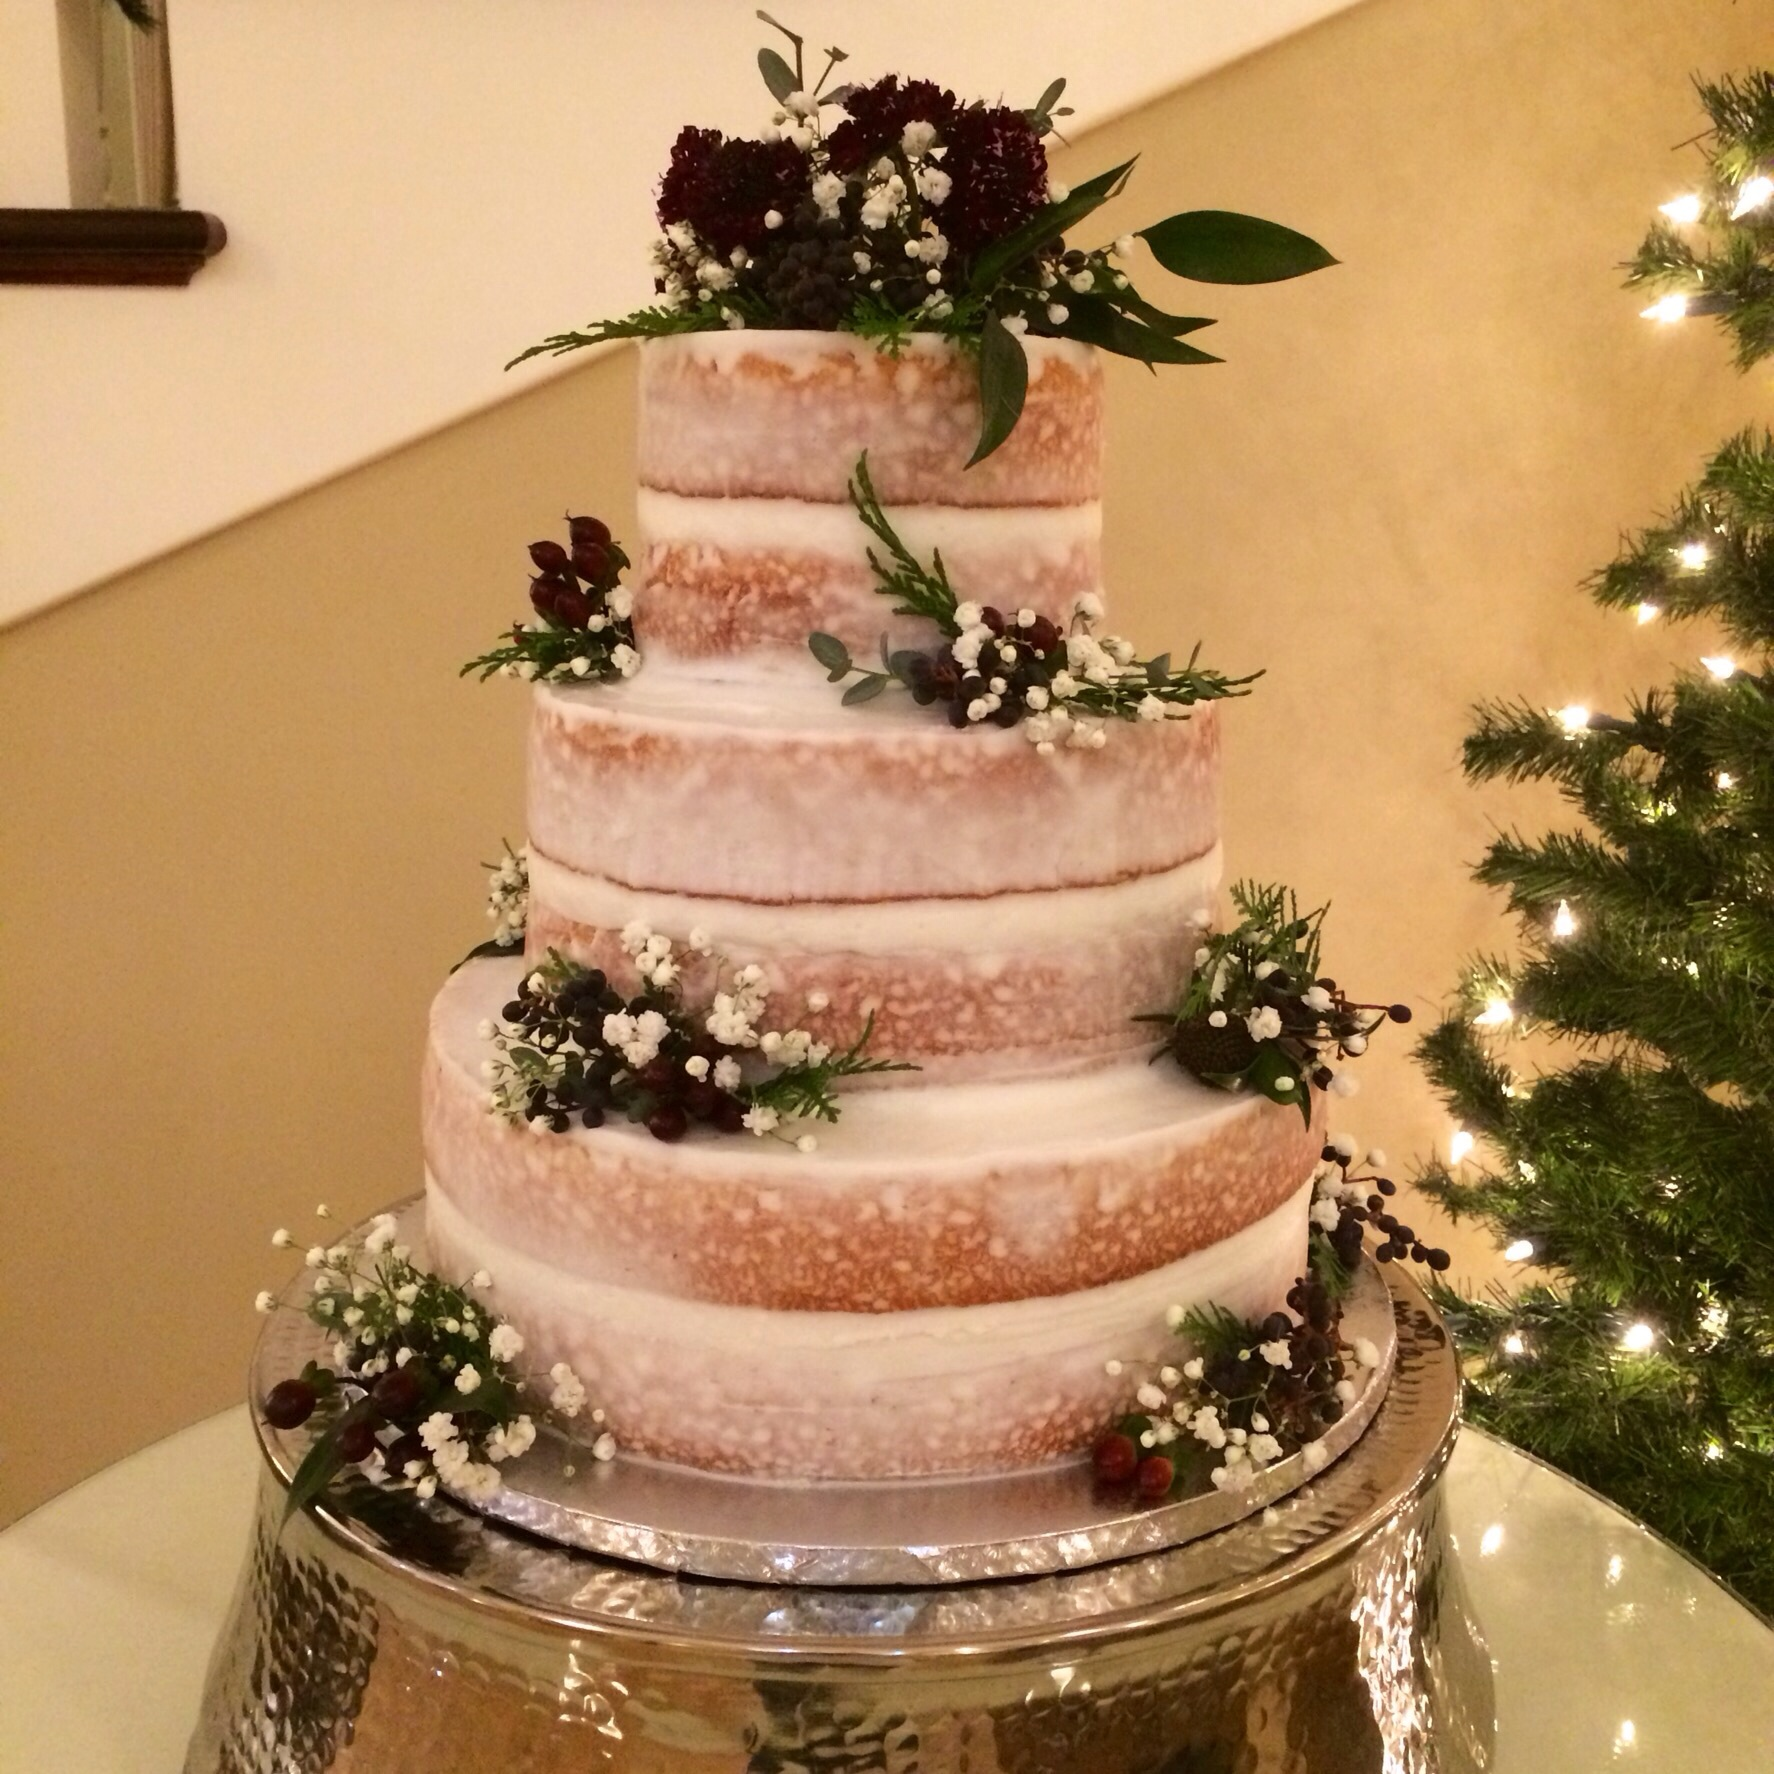 Naked cake with sugar